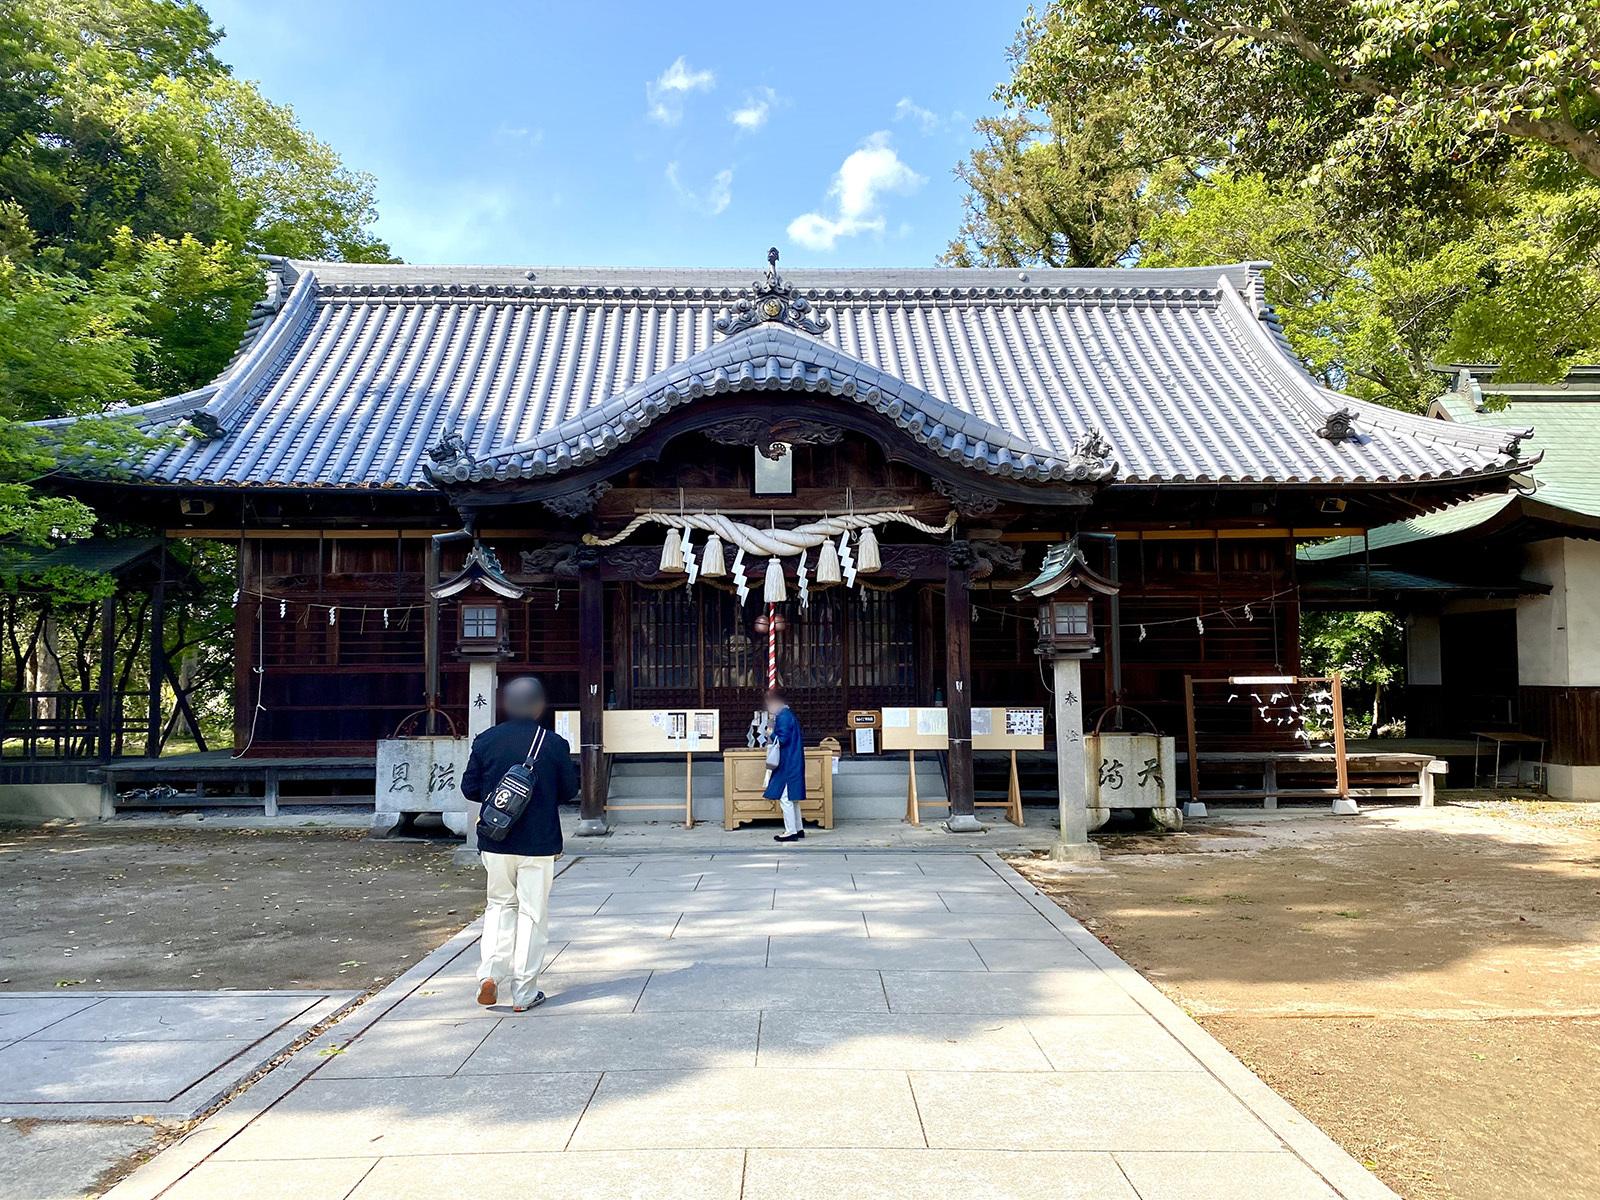 岩田神社 05 本堂